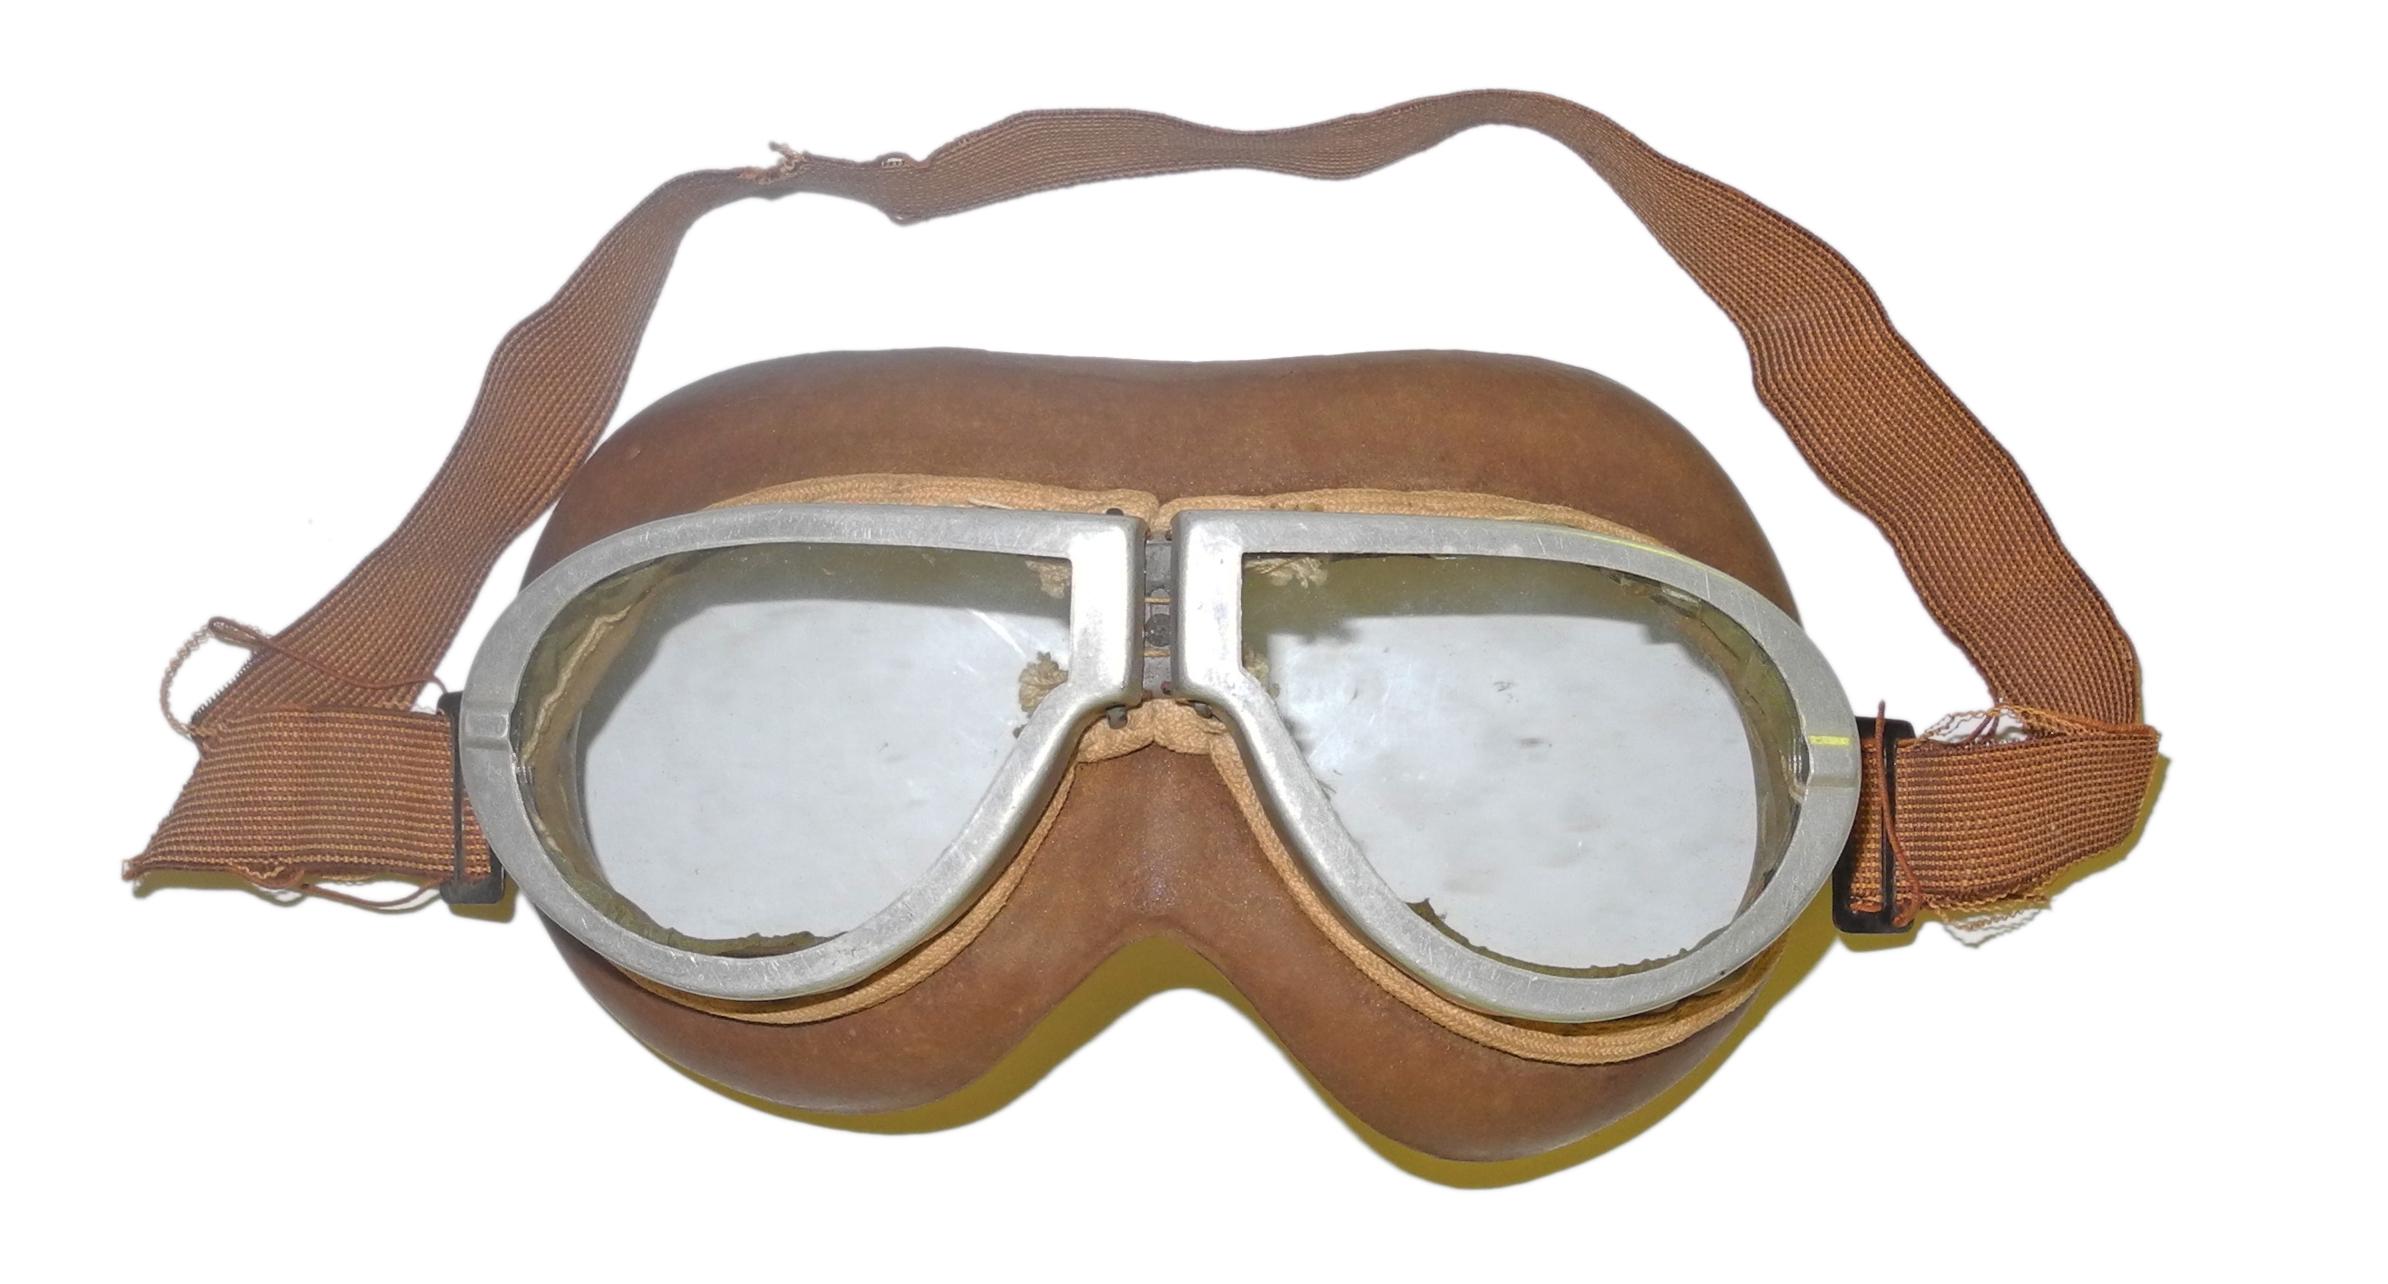 Resistol HB goggles